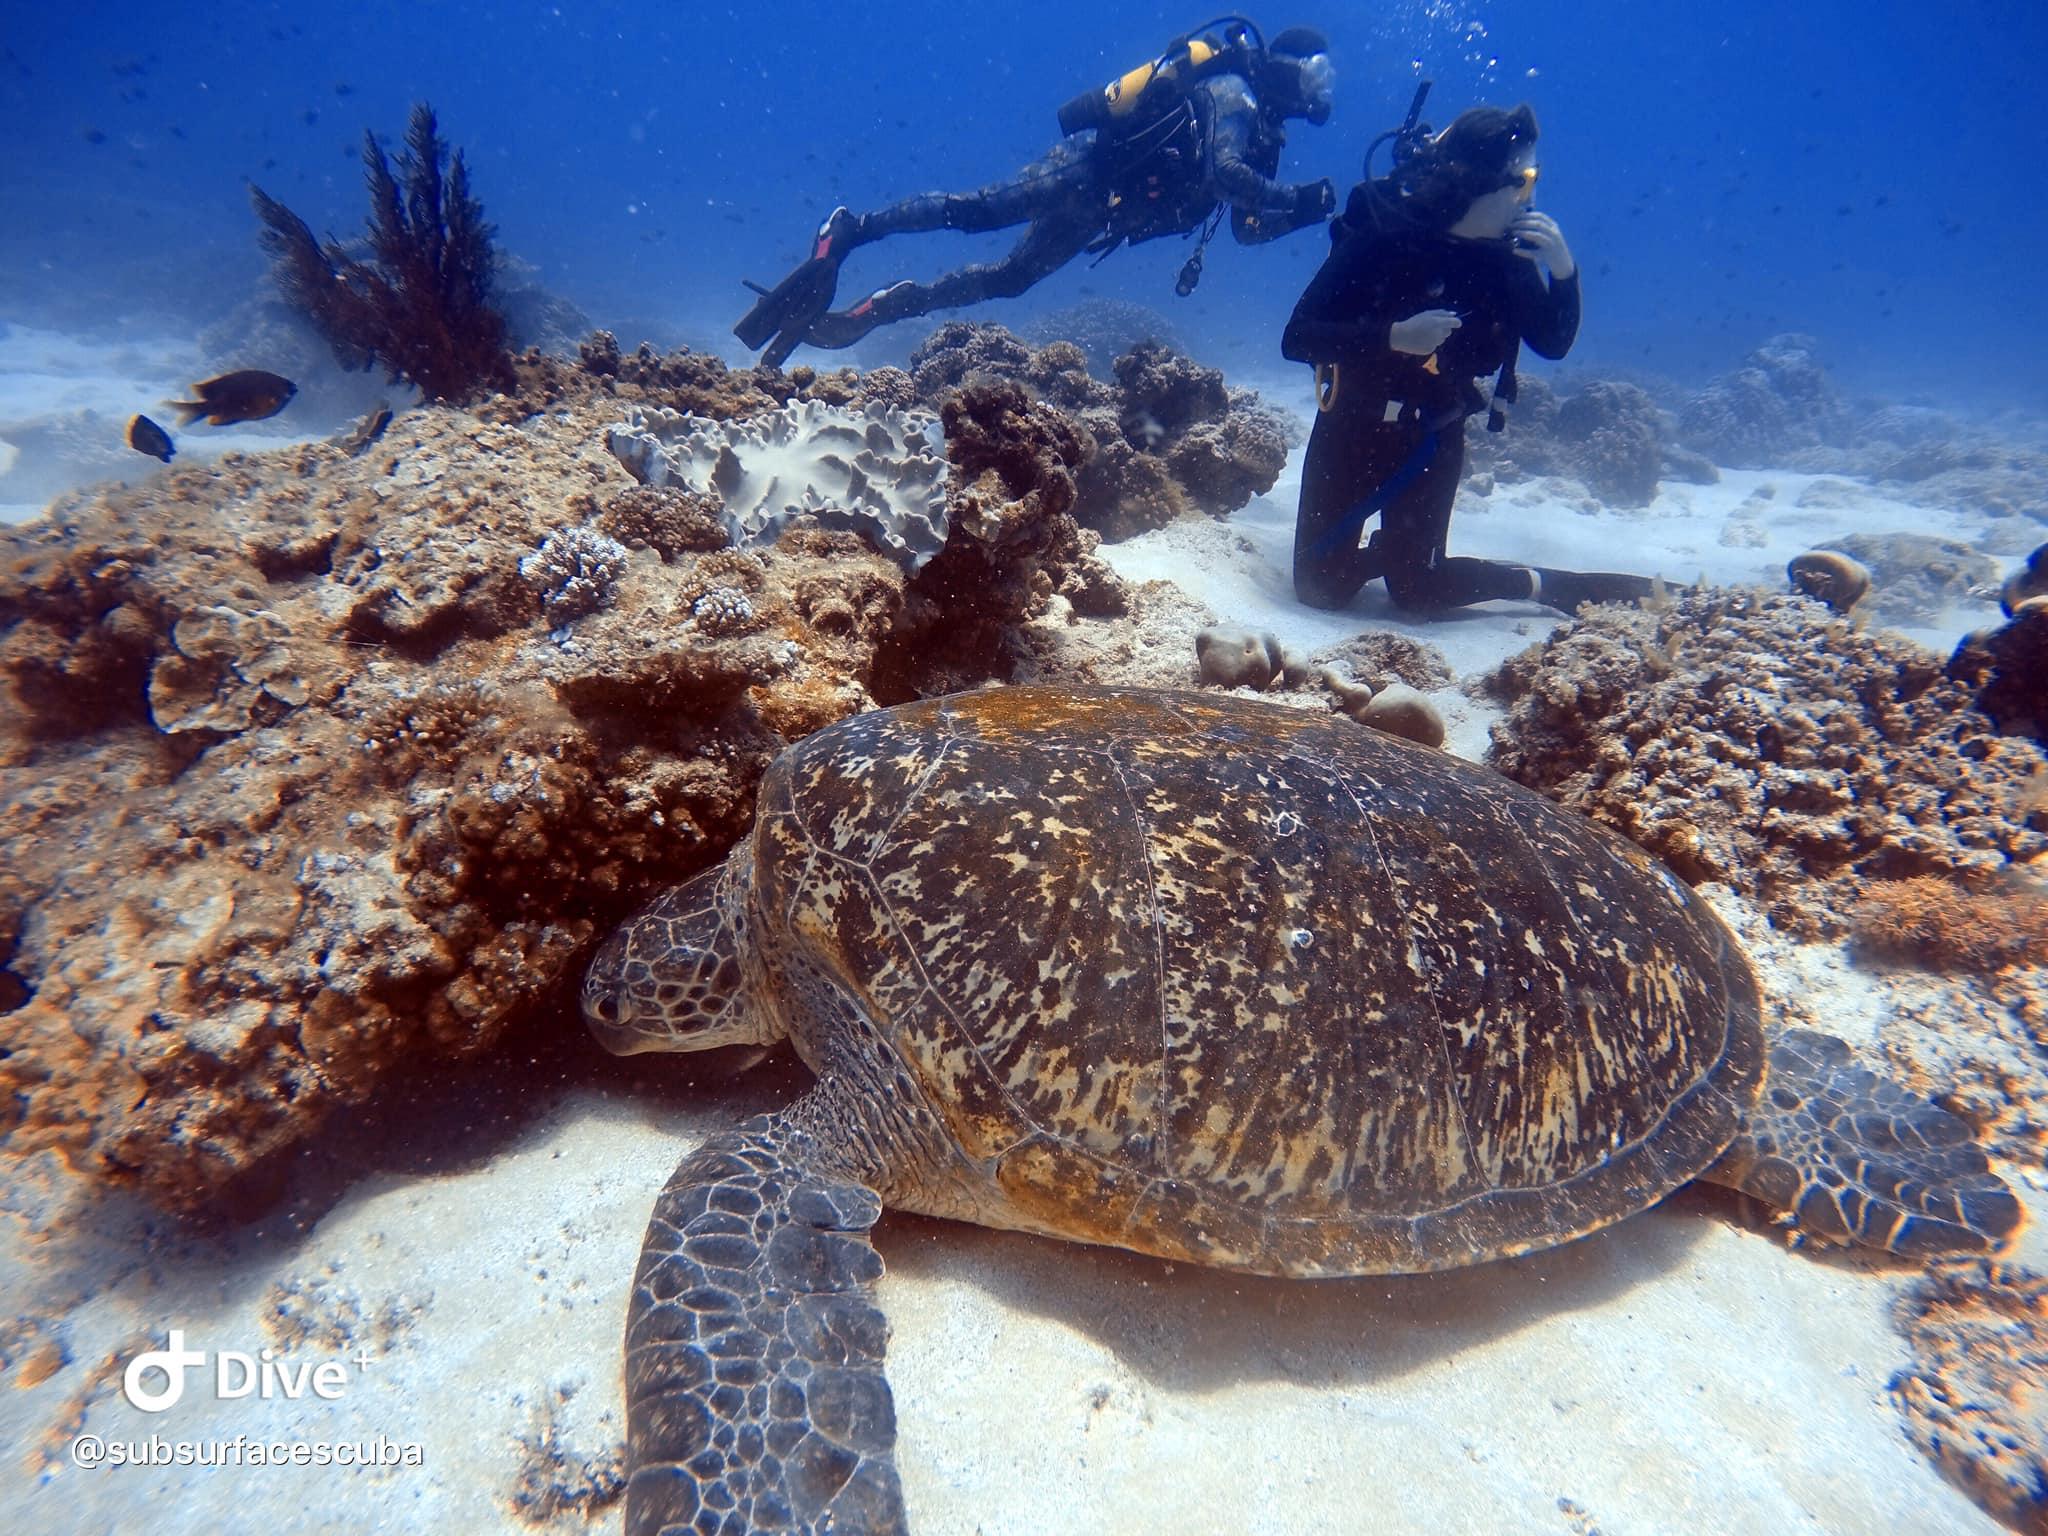 Scuba Diving Flinders Reef - Double Dive